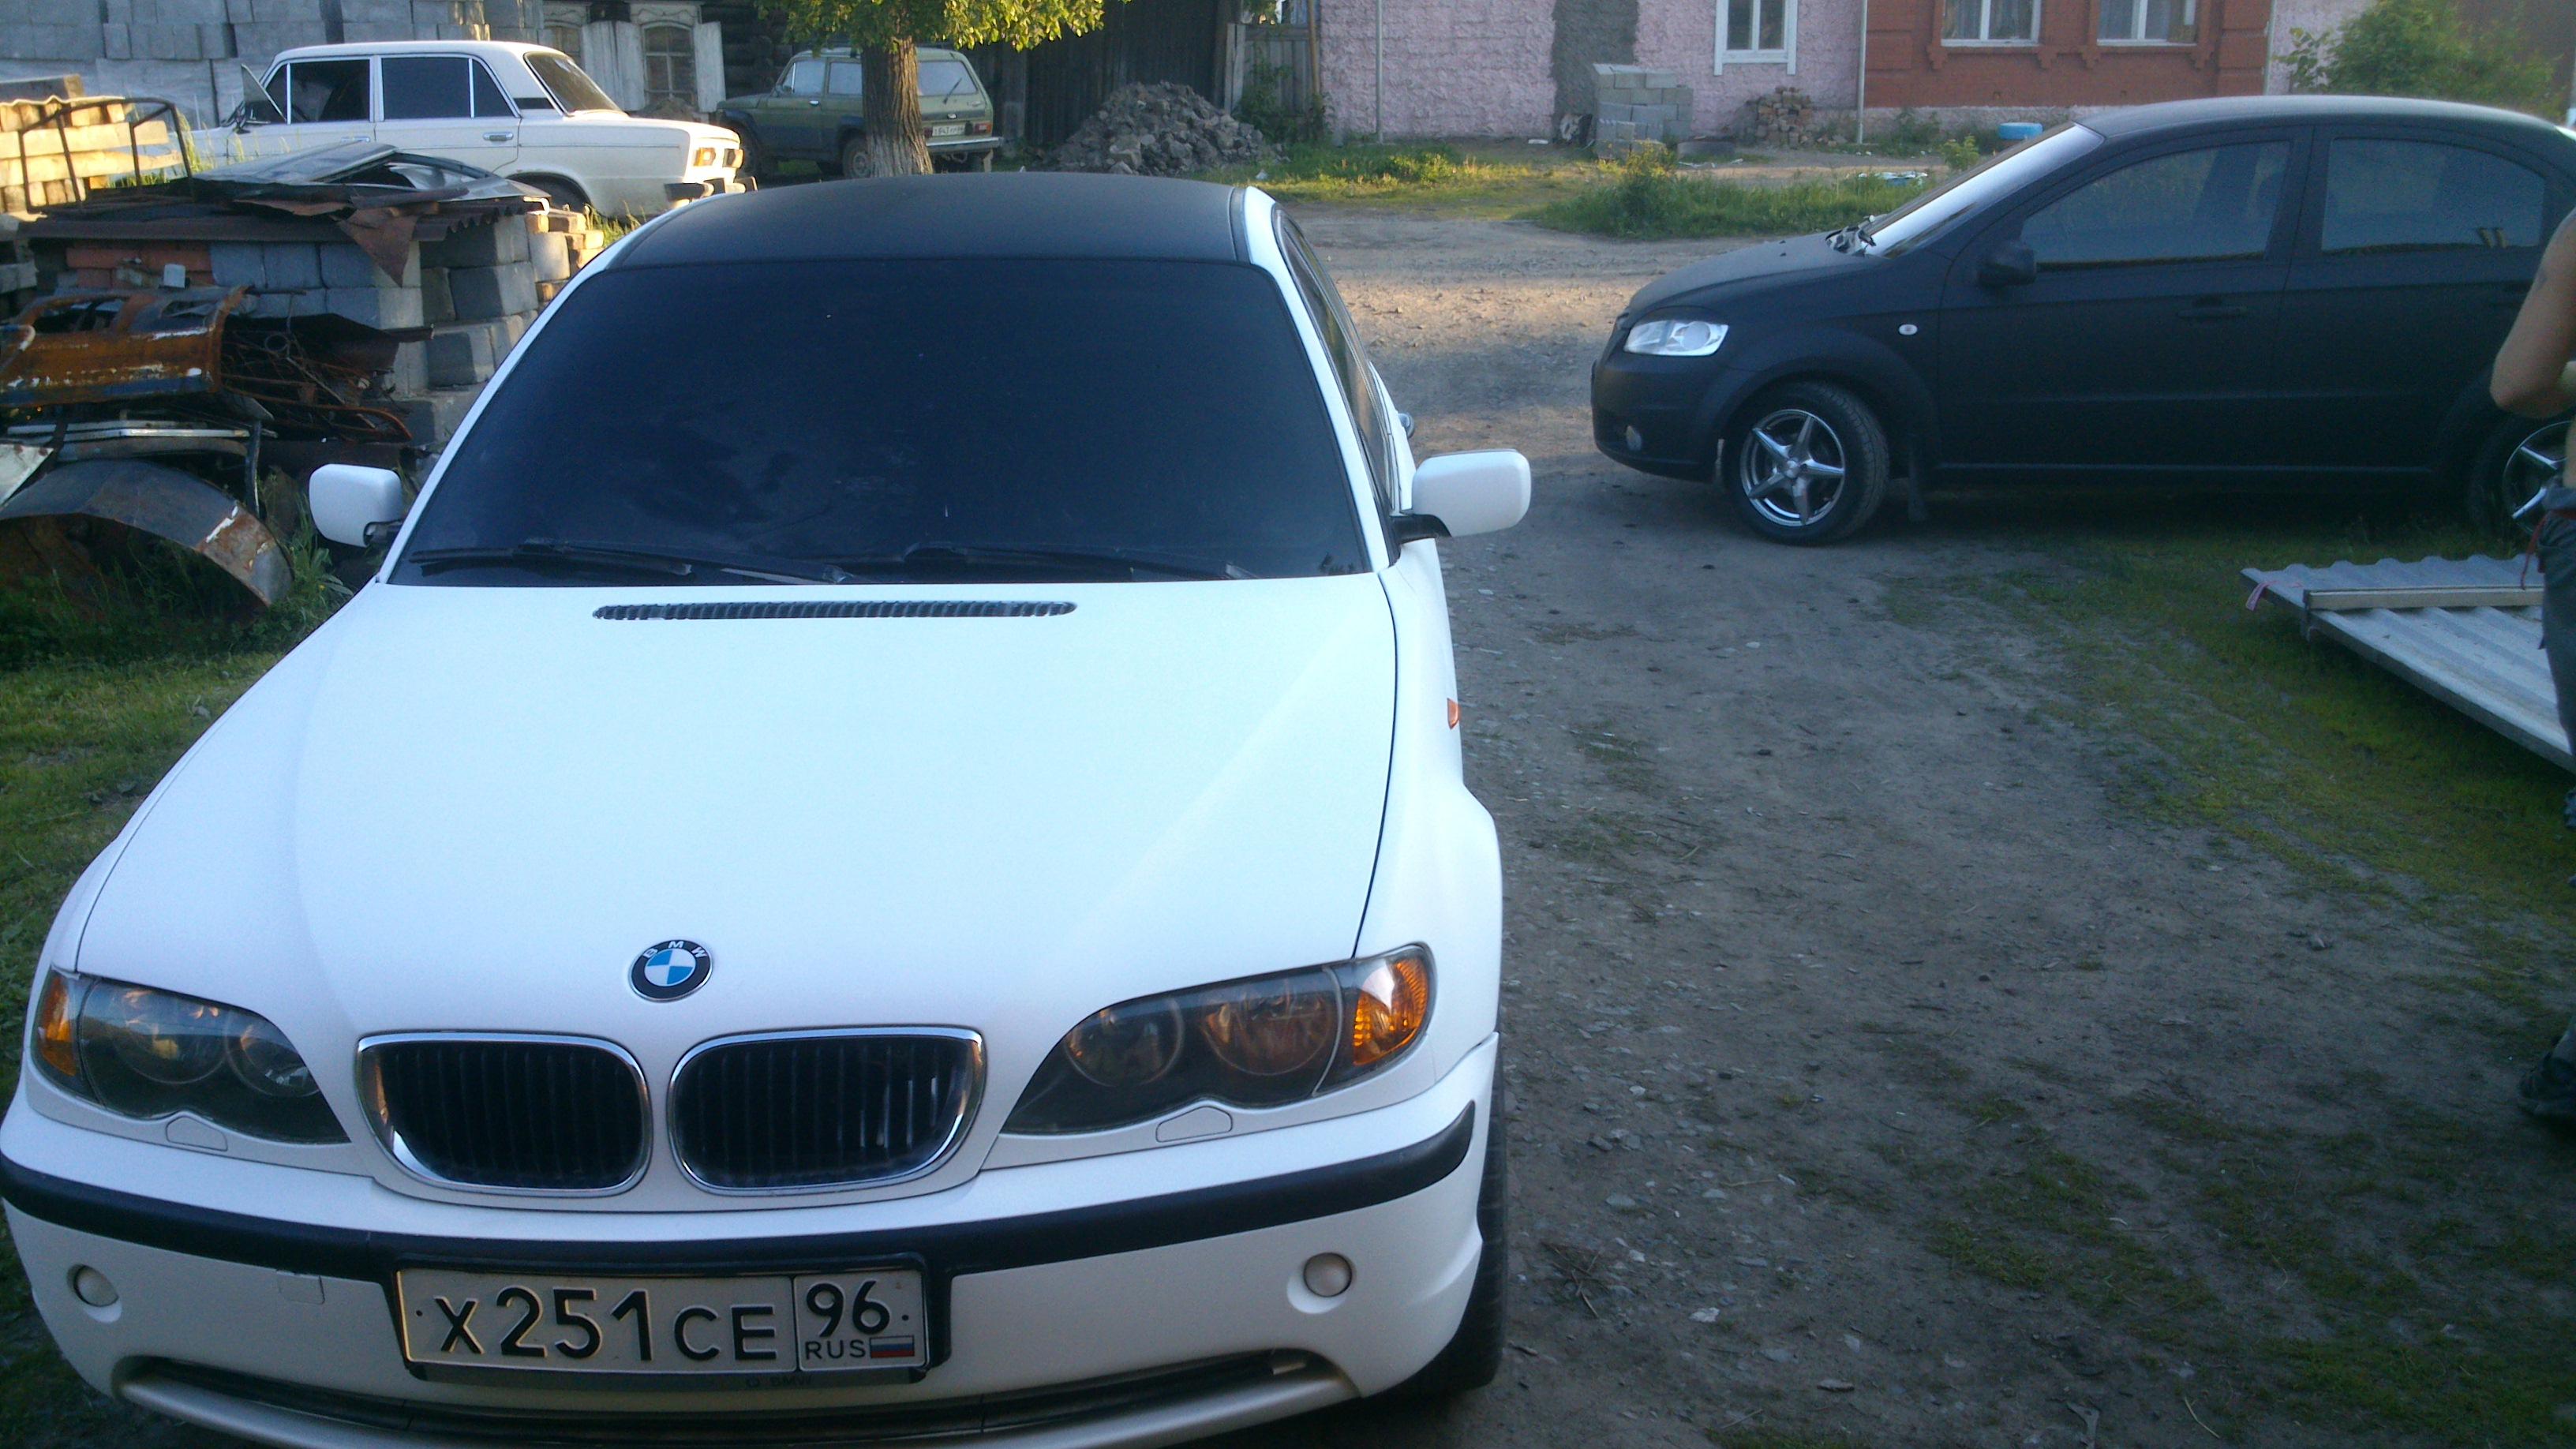 Белый матовый plasti dip на автомобиле